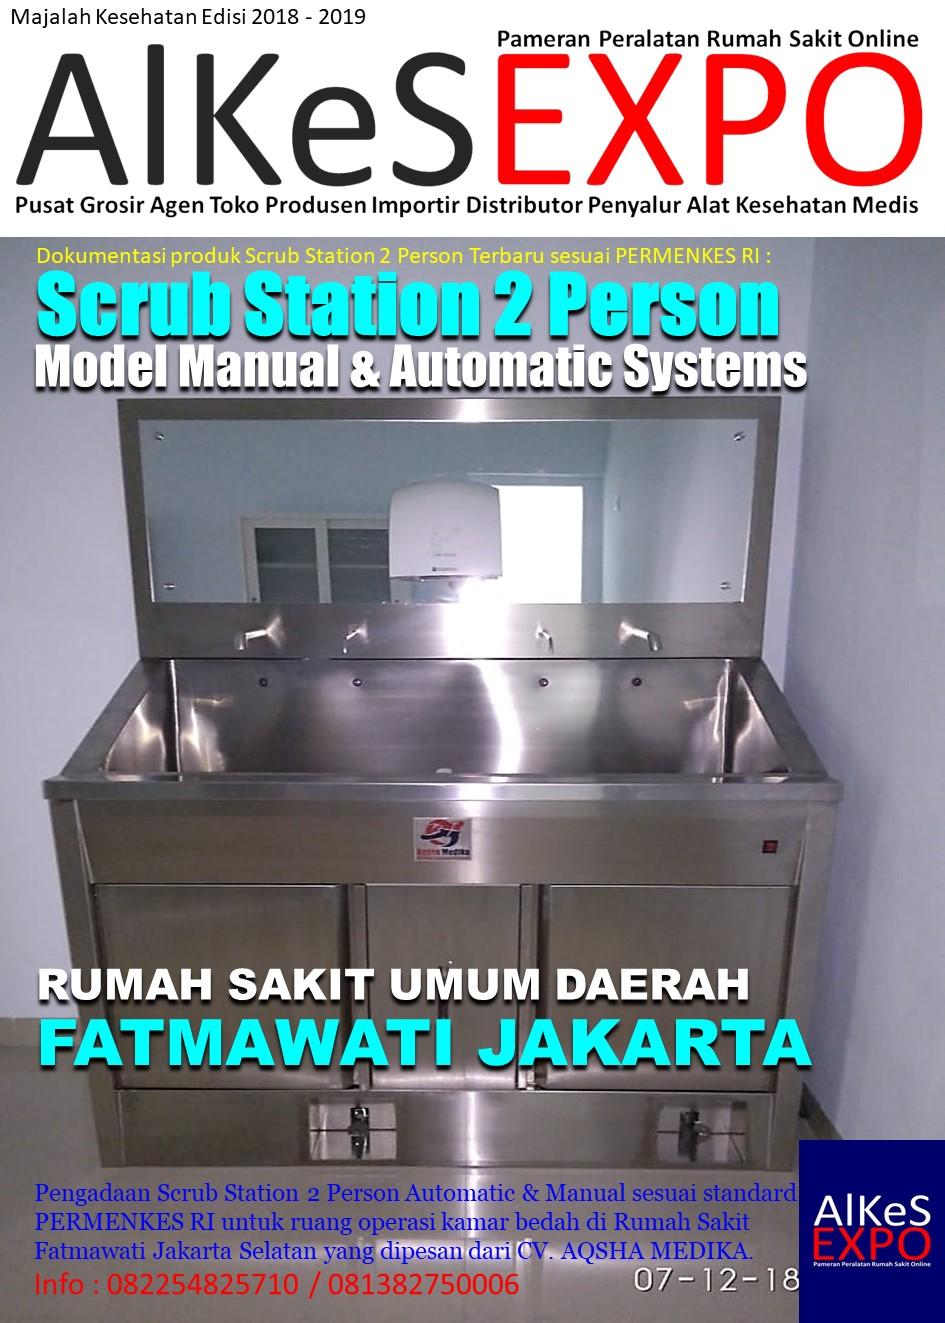 Scrub Station 2 Person Automatic And Manual Systems - Ruang Operasi Instalasi Kamar Bedah Rumah Sakit Fatmawati Jakarta Selatan